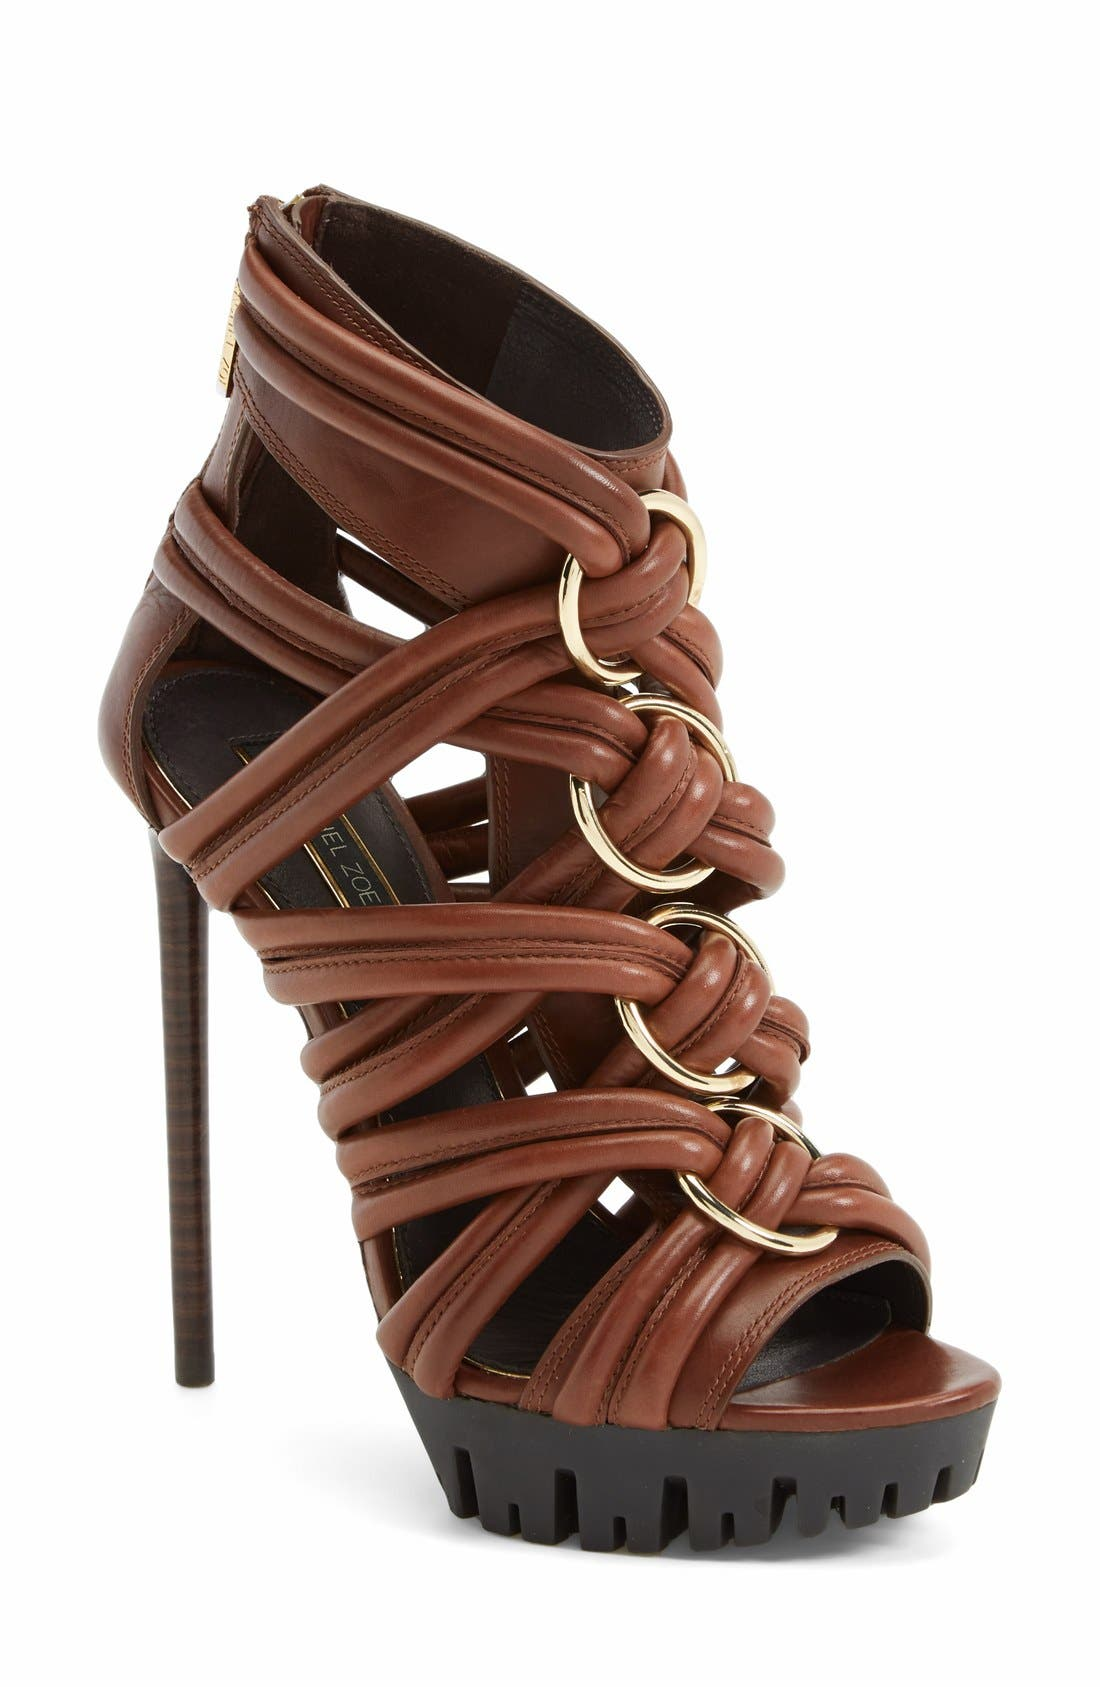 Main Image - Rachel Zoe 'Harlin' Leather Sandal (Women)